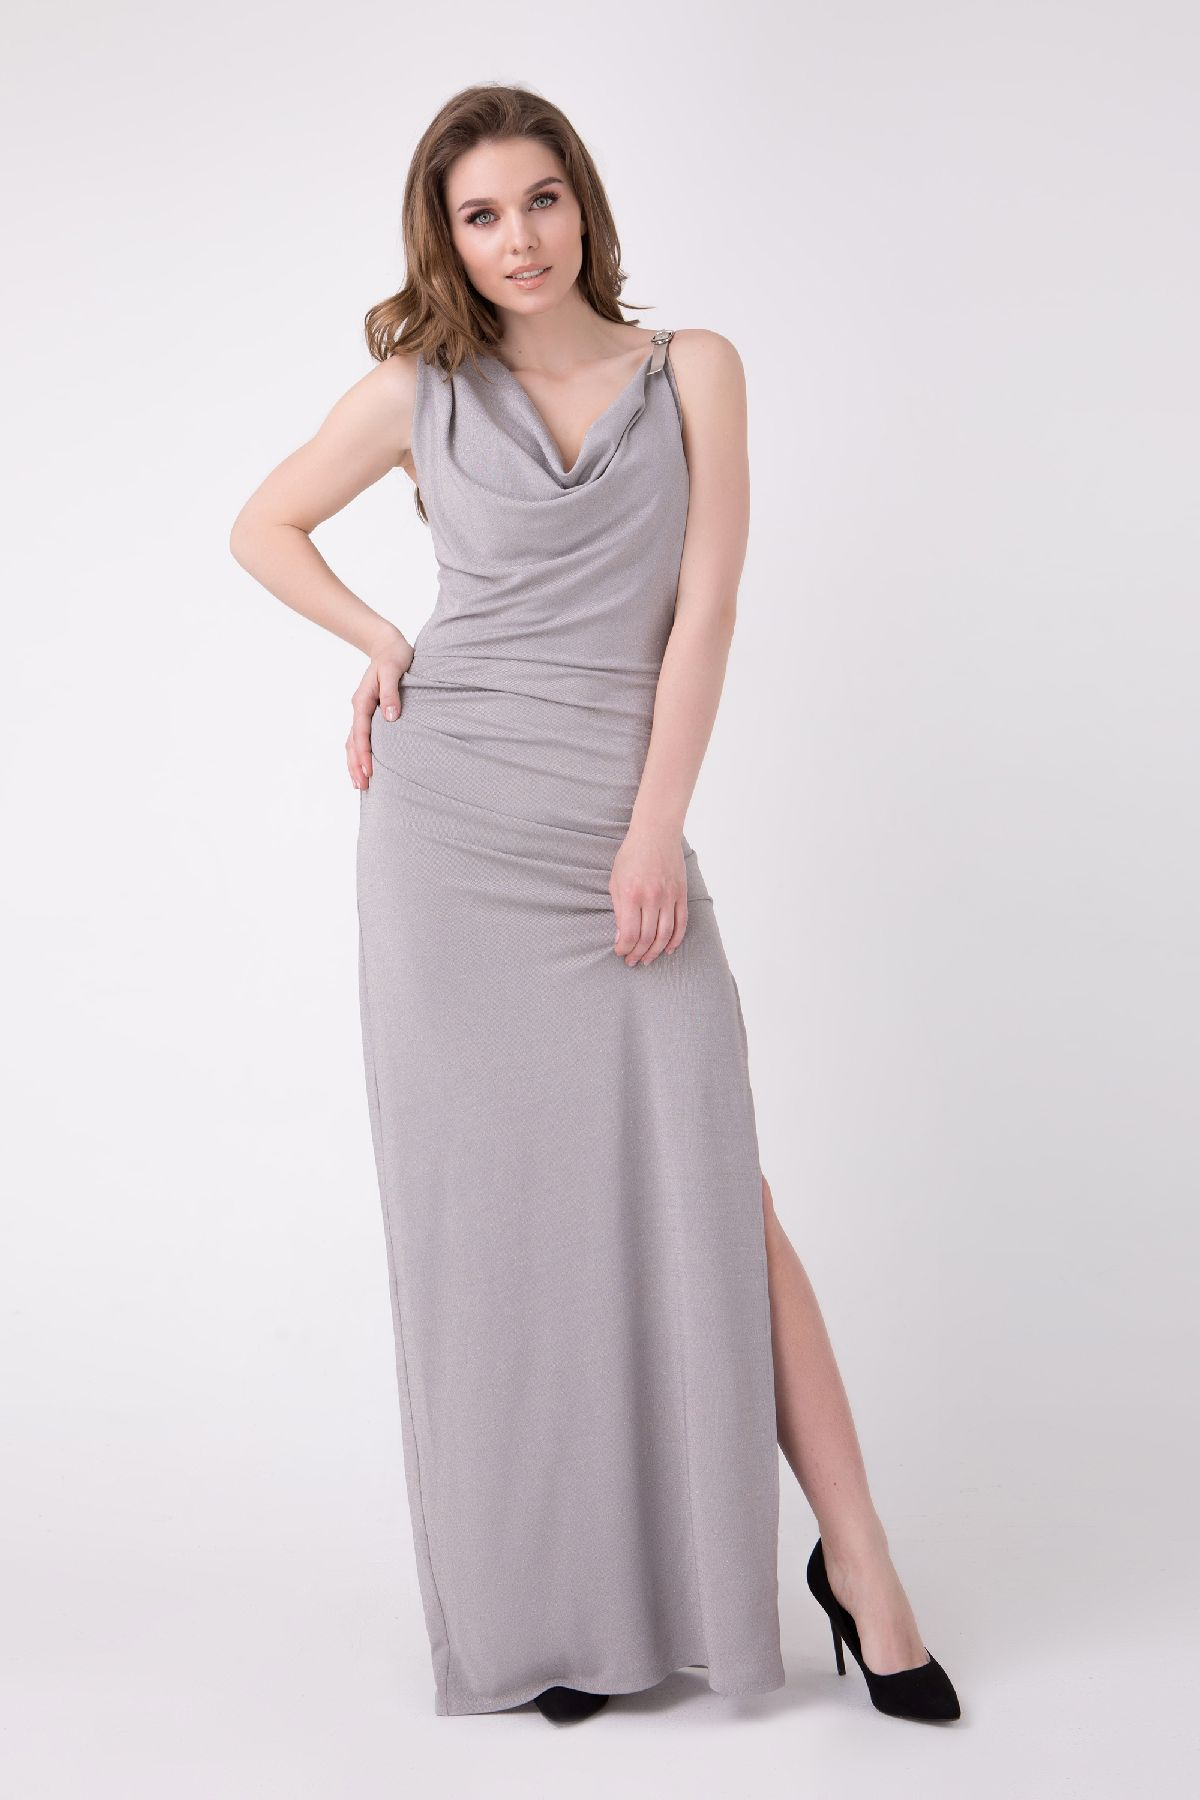 28e0cbc95efb7e2 Вечернее платье с вырезом | Купить вечернее платье за 1 890 грн. в ...